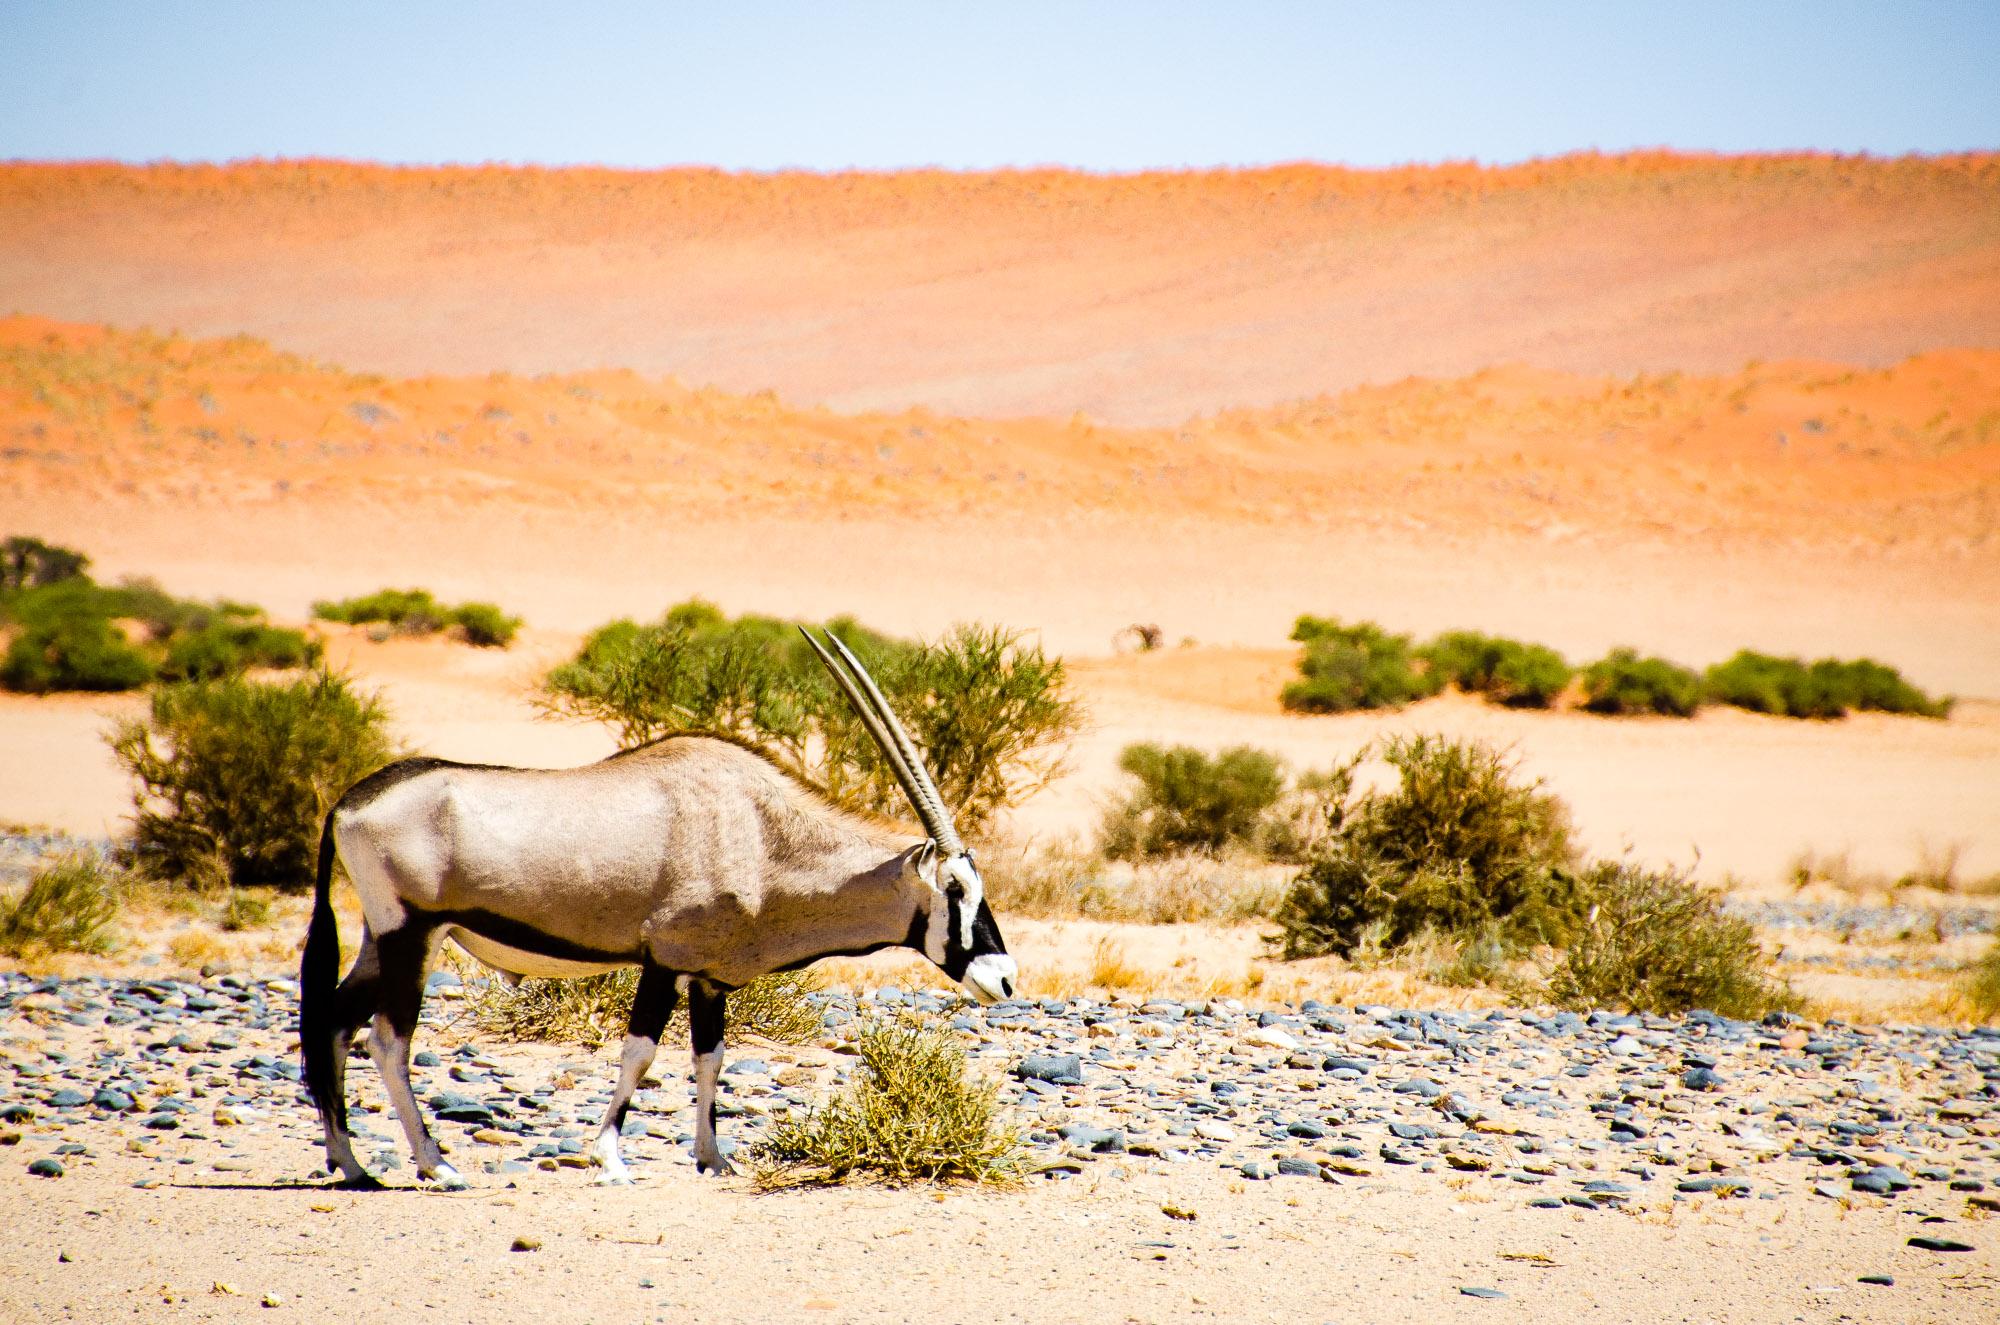 oryx - swakopmund - le desert du namibie - afrique, namibie